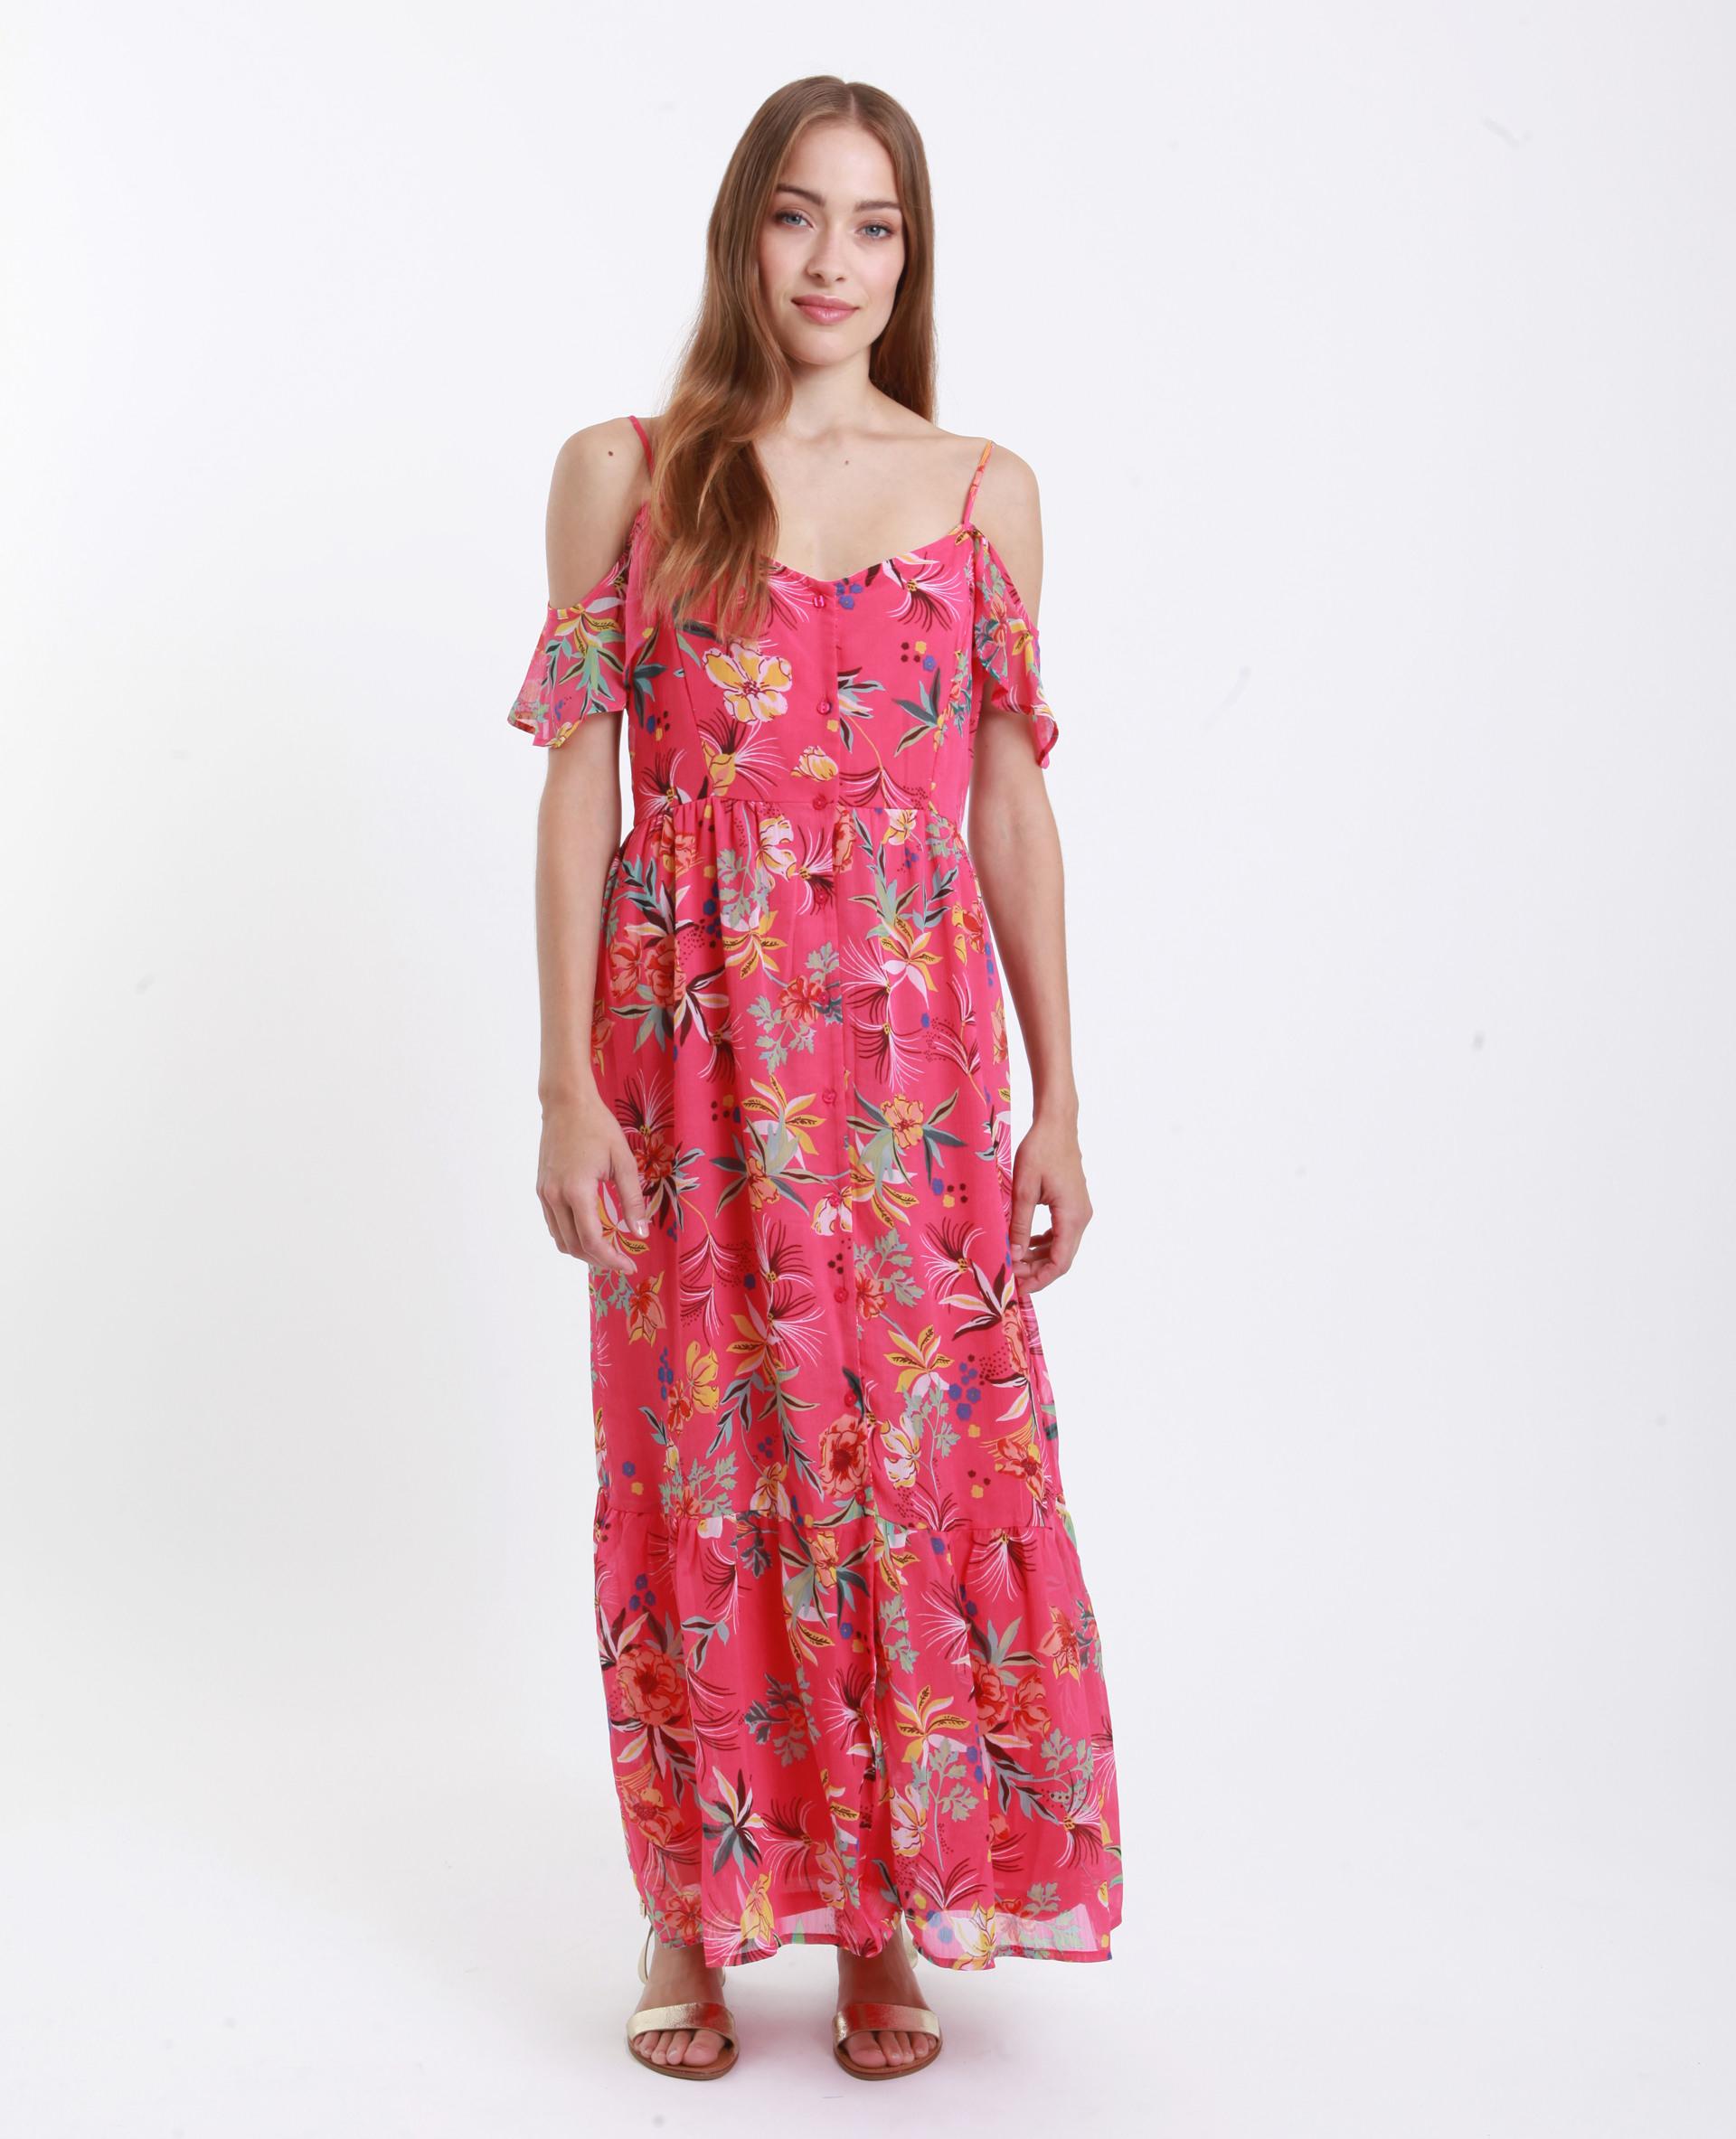 Langes Schulterfreies Kleid Rot  781245307E0A  Pimkie